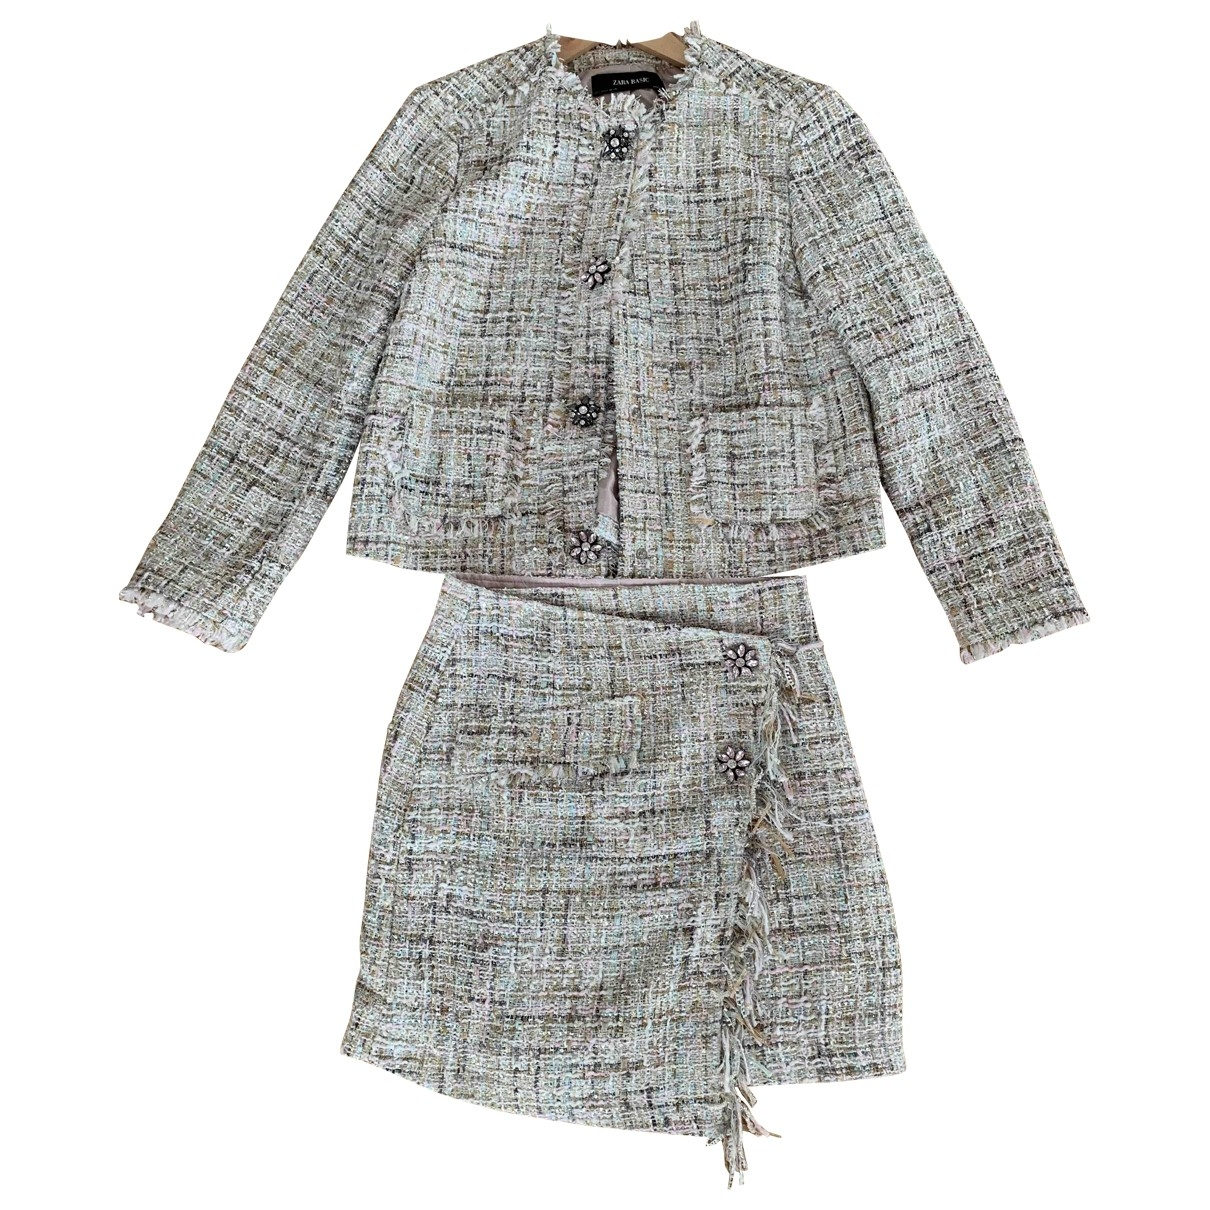 Zara \N Multicolour Cotton dress for Women S International